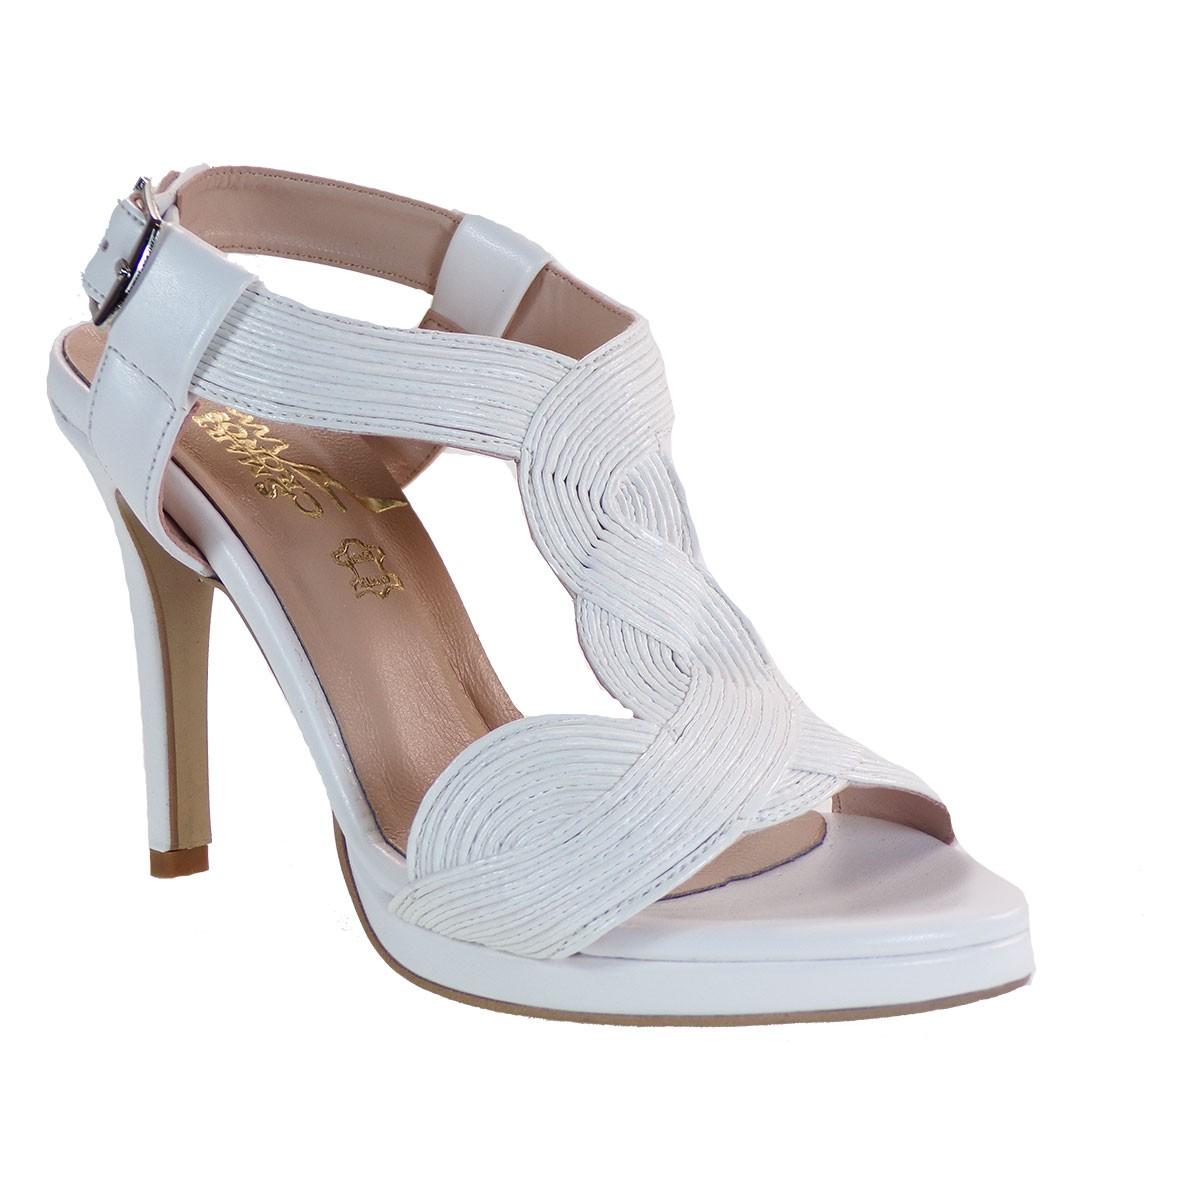 Smart Cronos Γυναικεία Παπούτσια Πέδιλα 7110-3493 Λευκό Μπαμπού